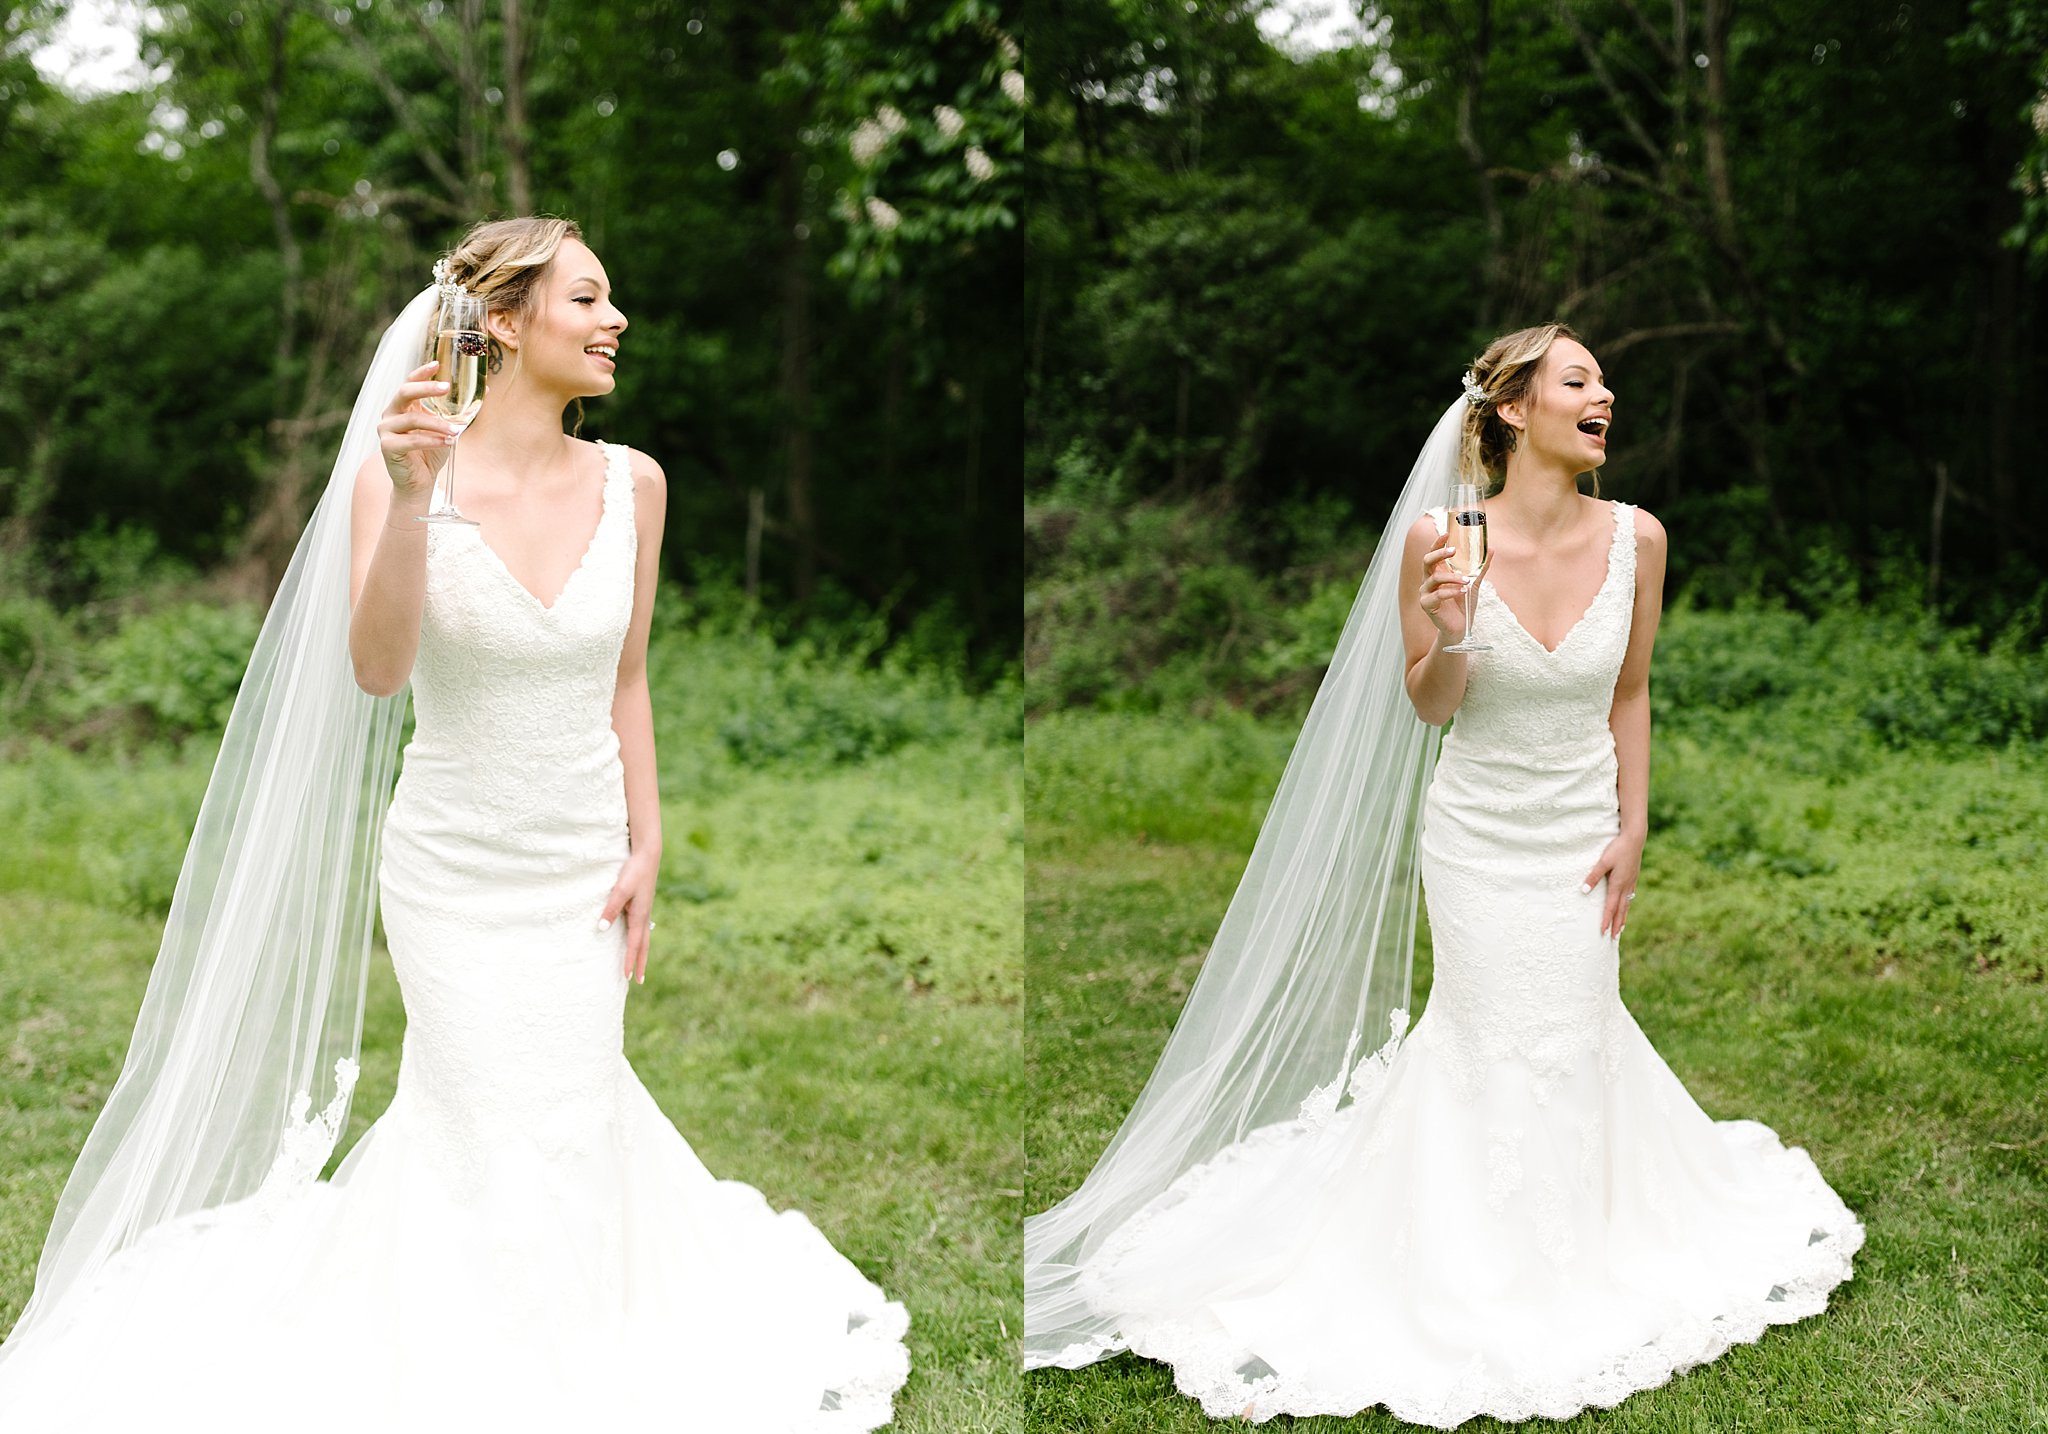 bridal gowns near boston massachusetts.jpg